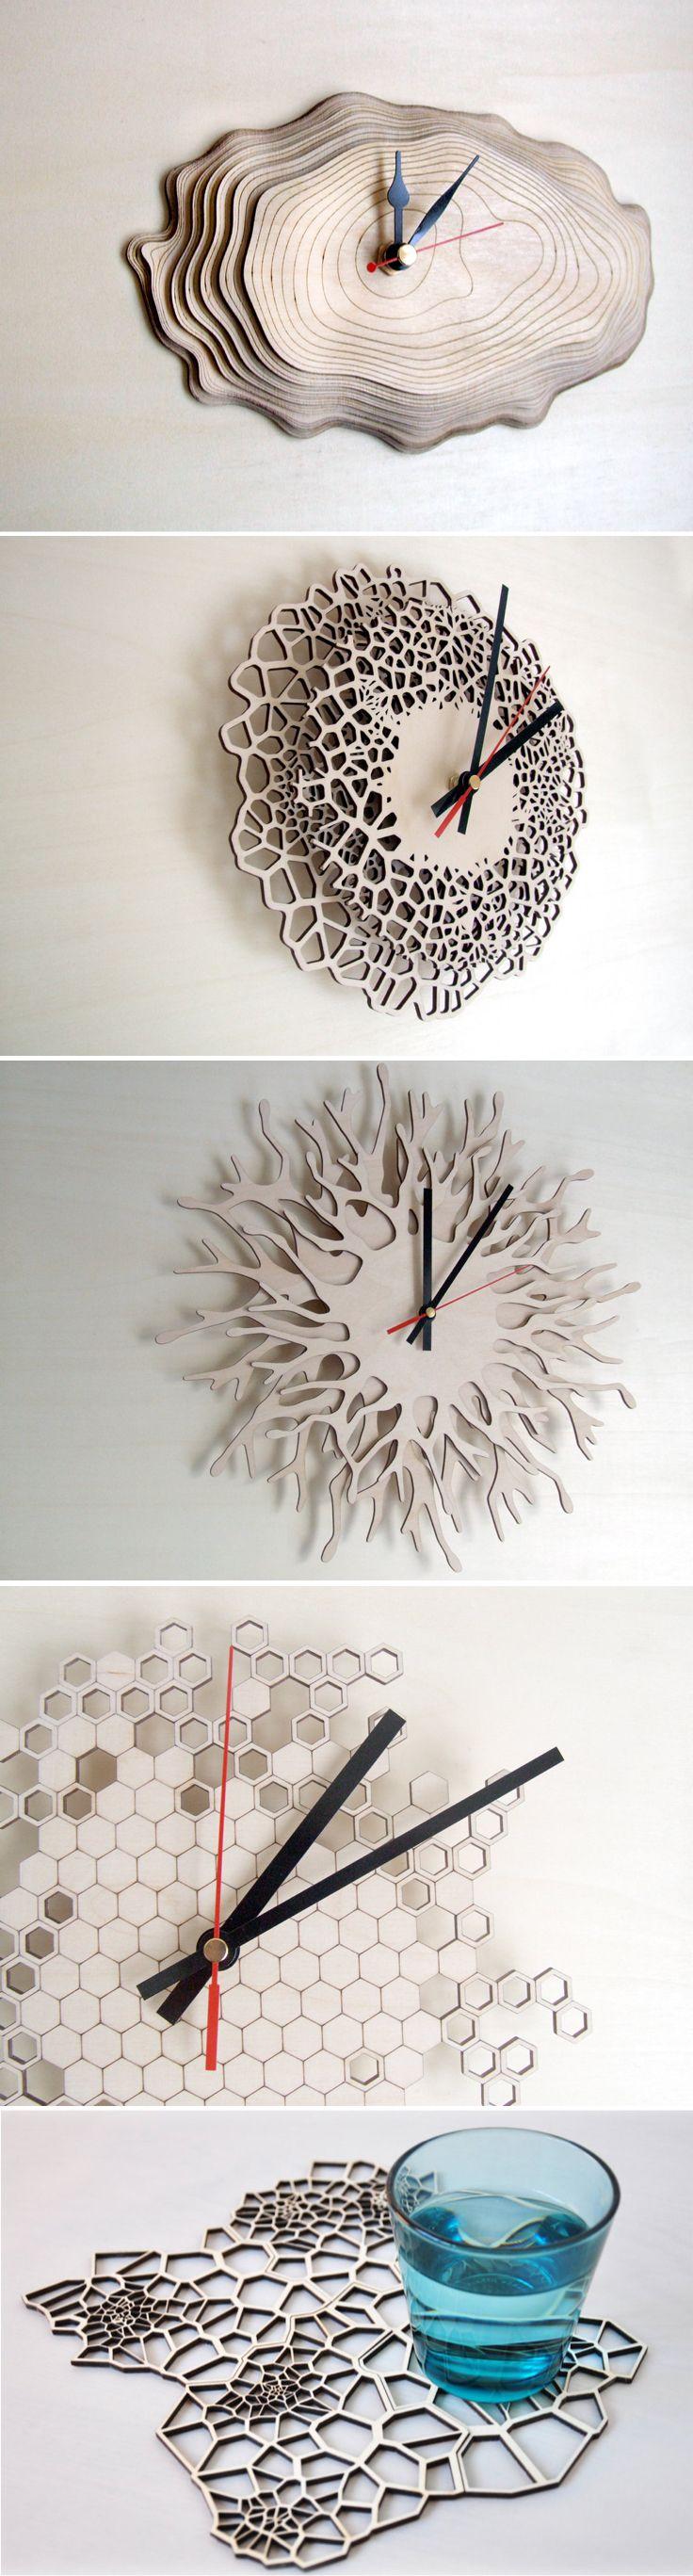 Asymmetree Nature-Inspired Wood Clocks